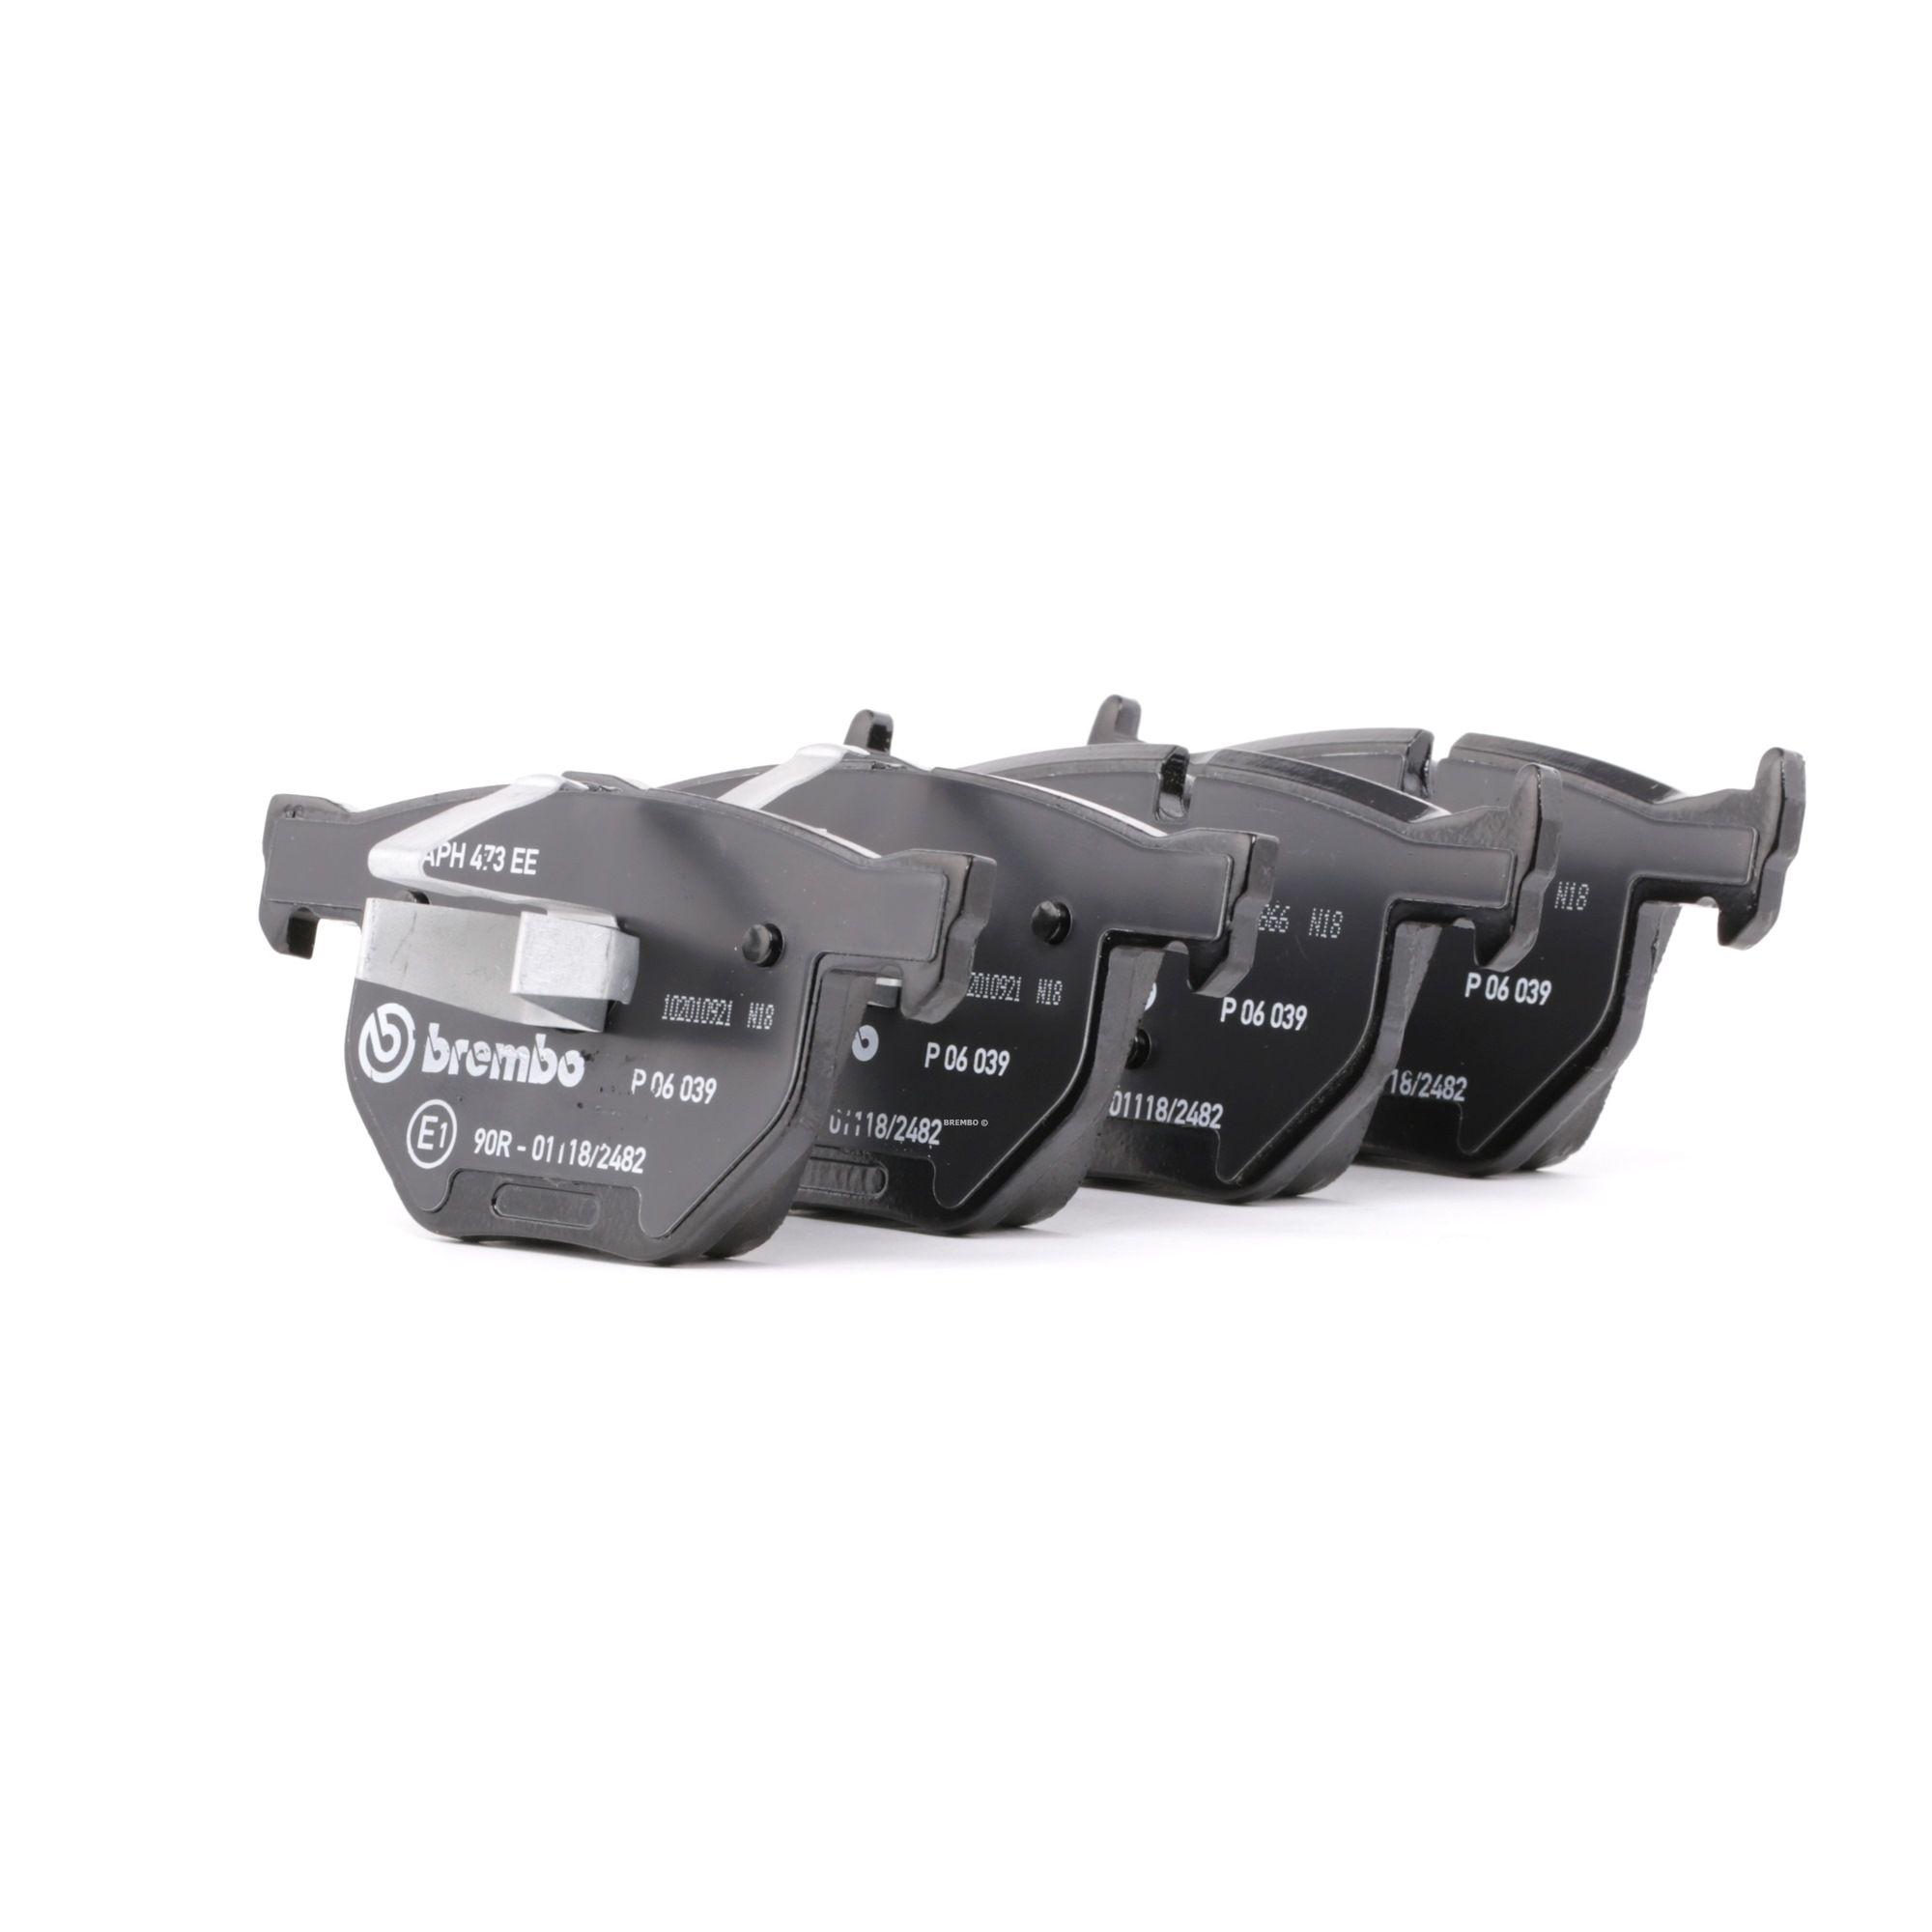 Disk brake pads BREMBO D11707427 rating